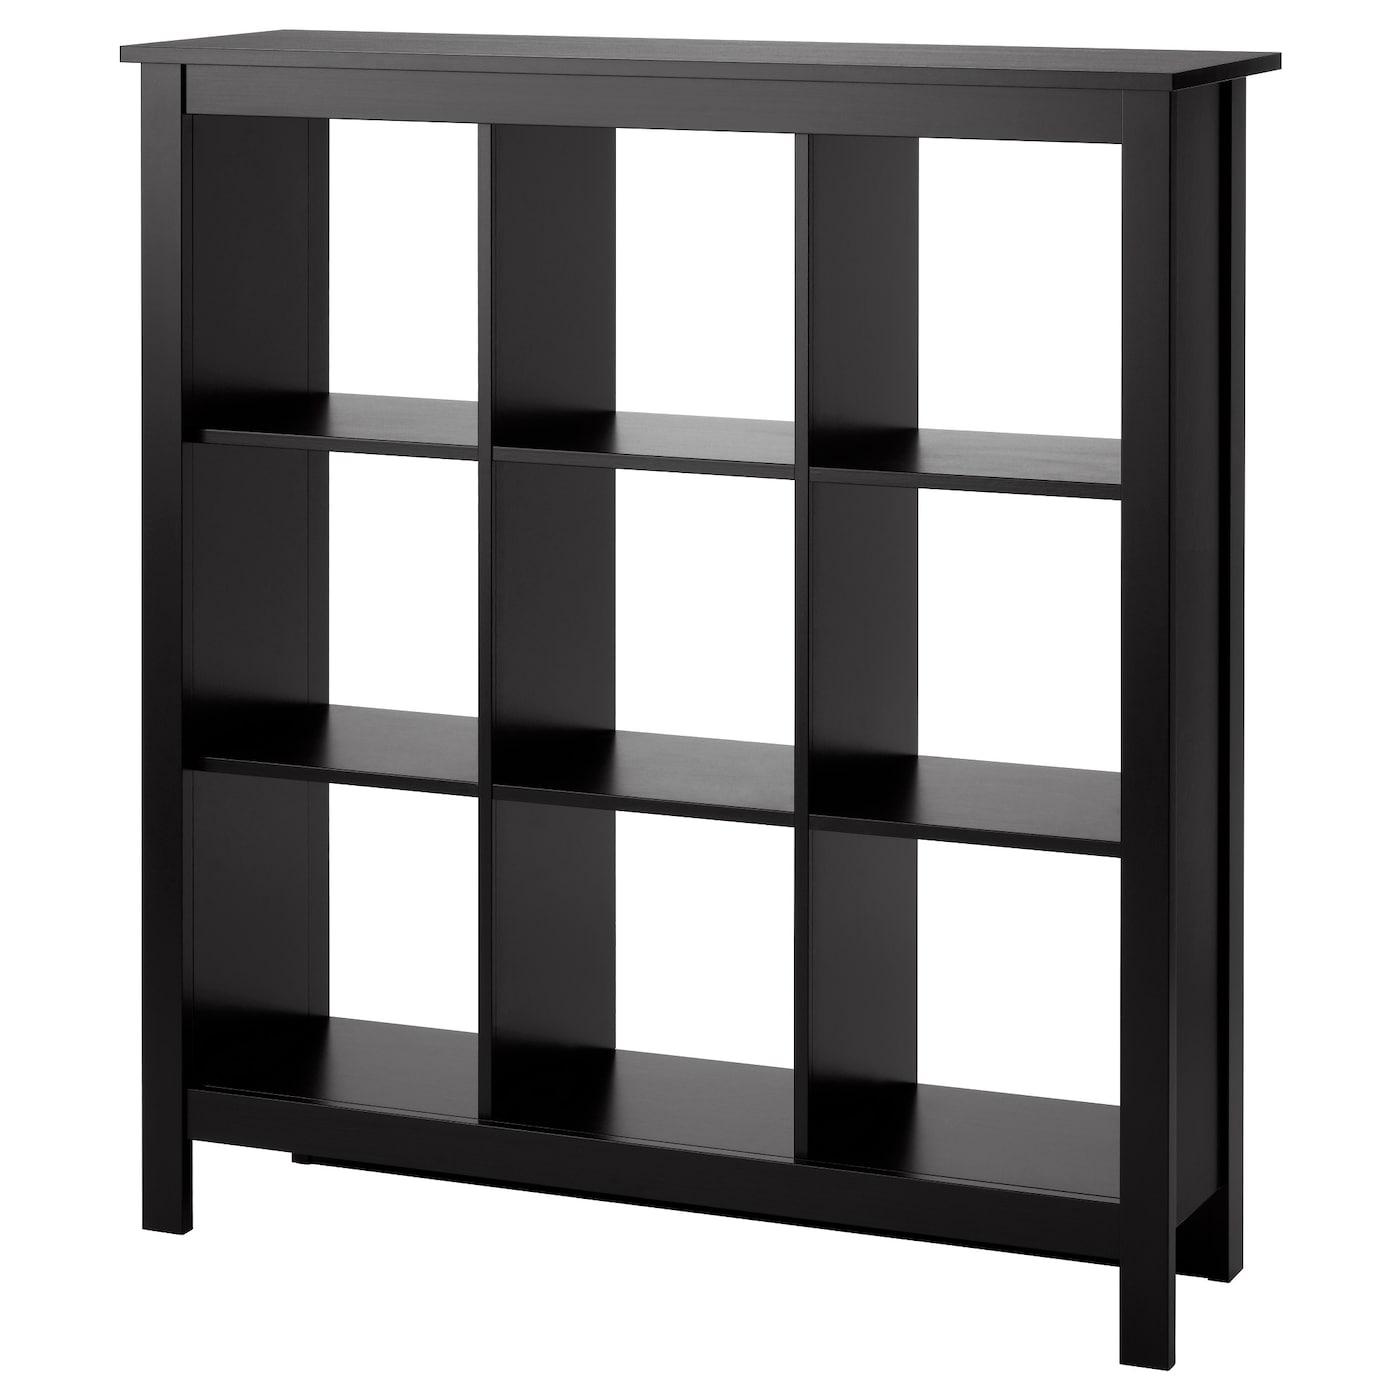 etag res rangements modulables ikea. Black Bedroom Furniture Sets. Home Design Ideas